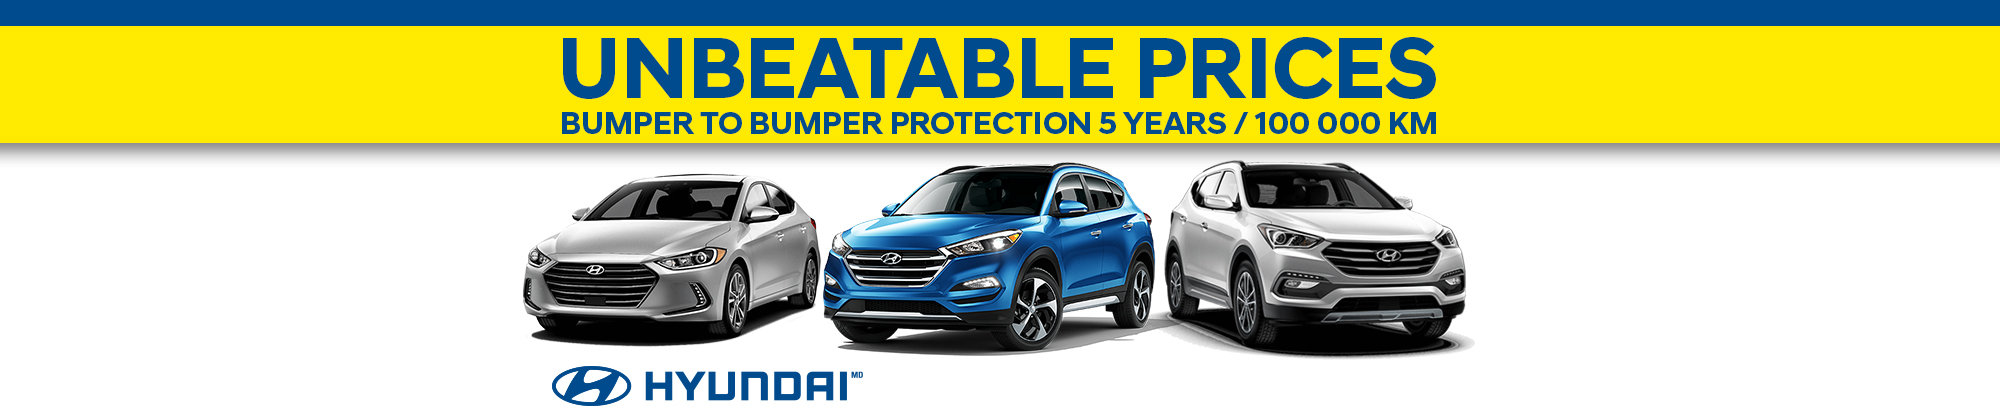 Unbeatable Prices Hyundai web